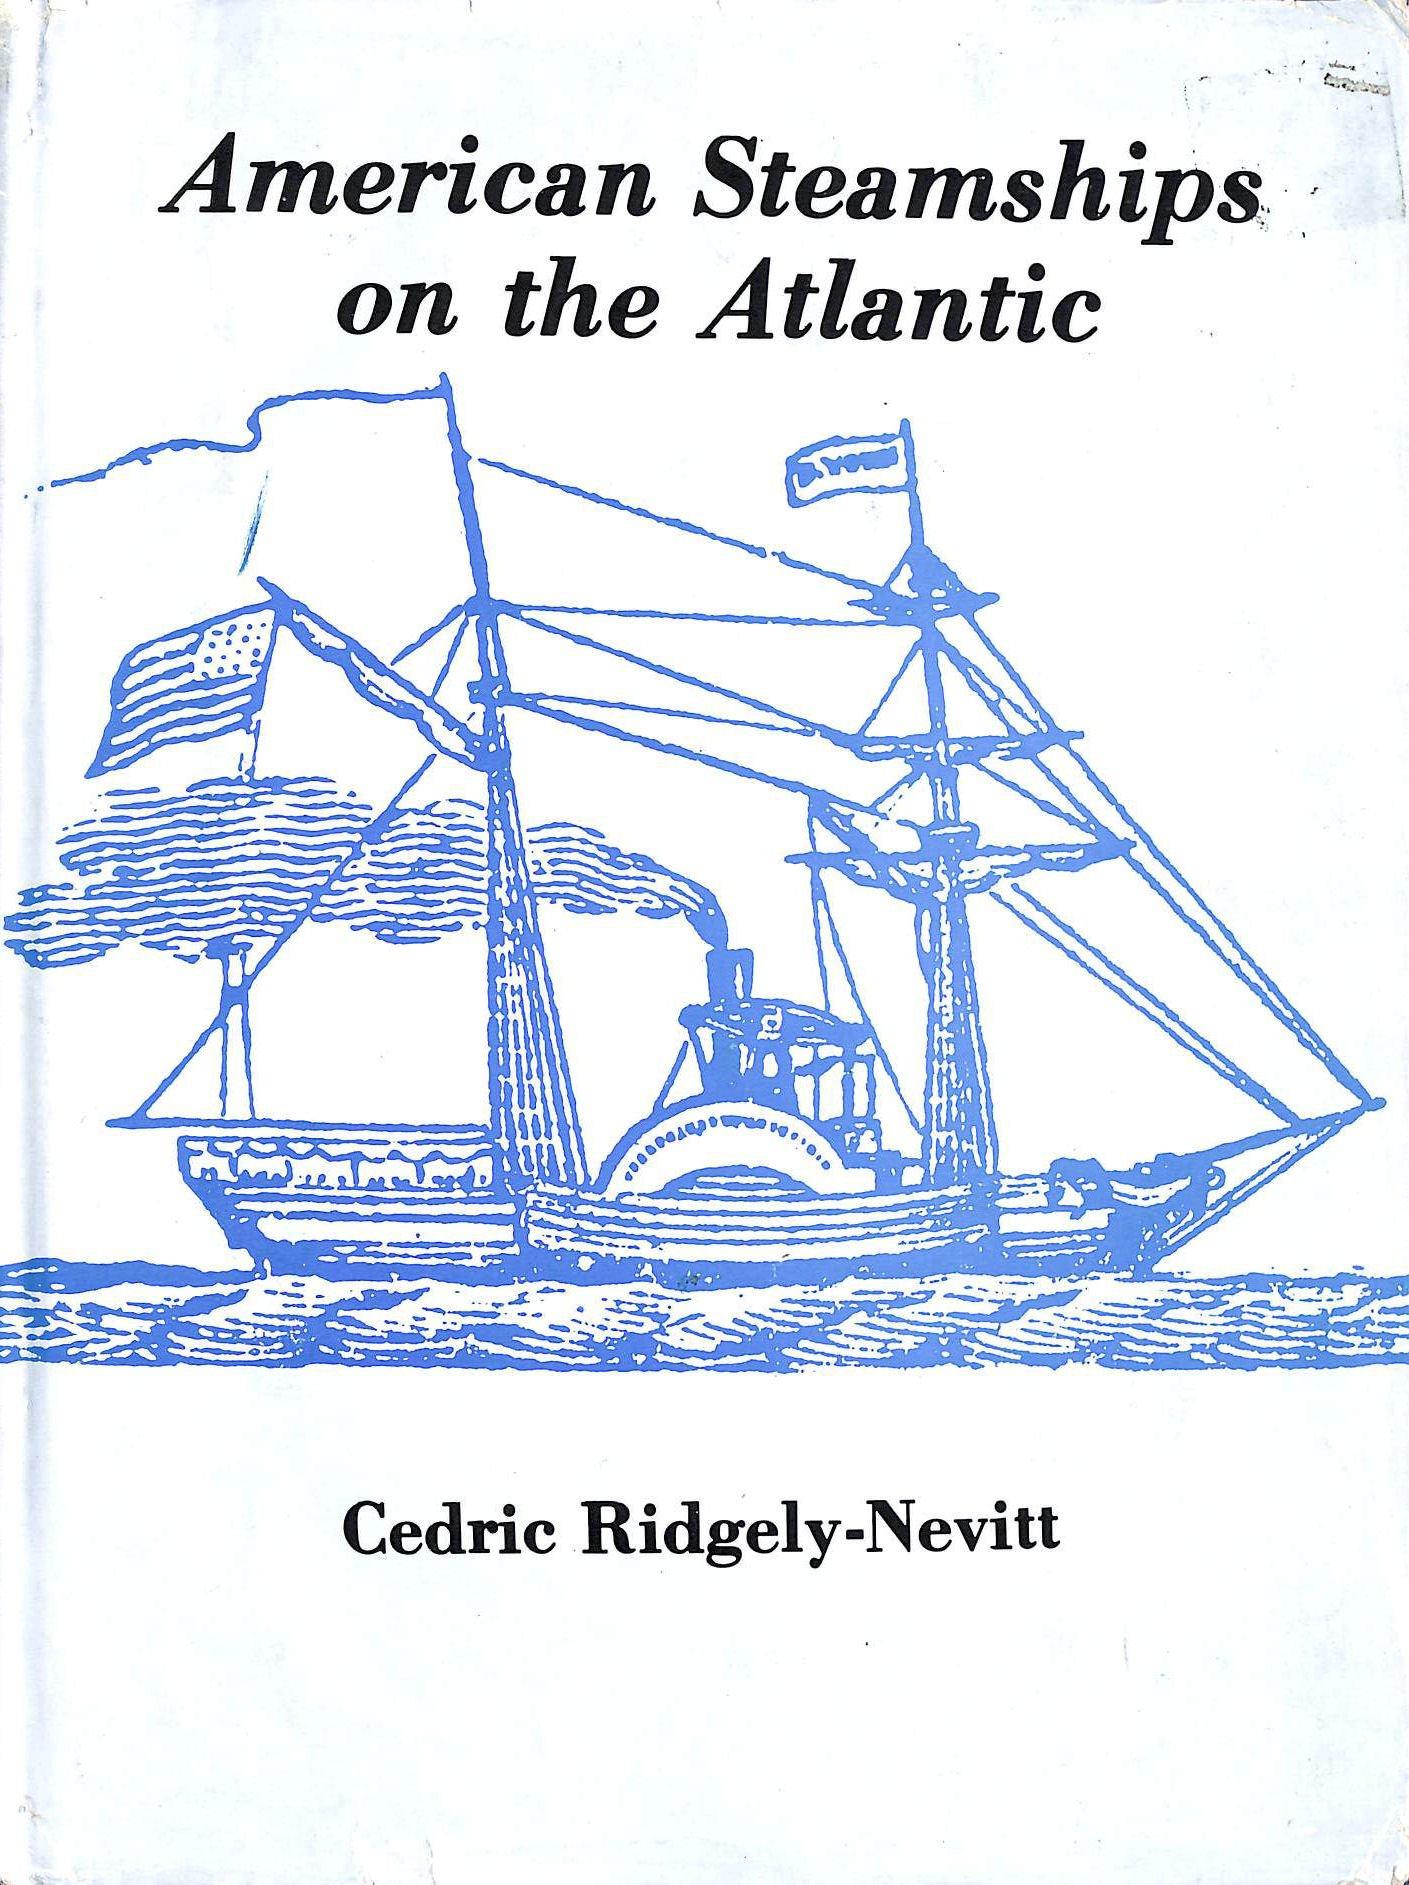 American Steamships on the Atlantic: Cedric Ridgely-Nevitt: 9780874131406:  Amazon.com: Books